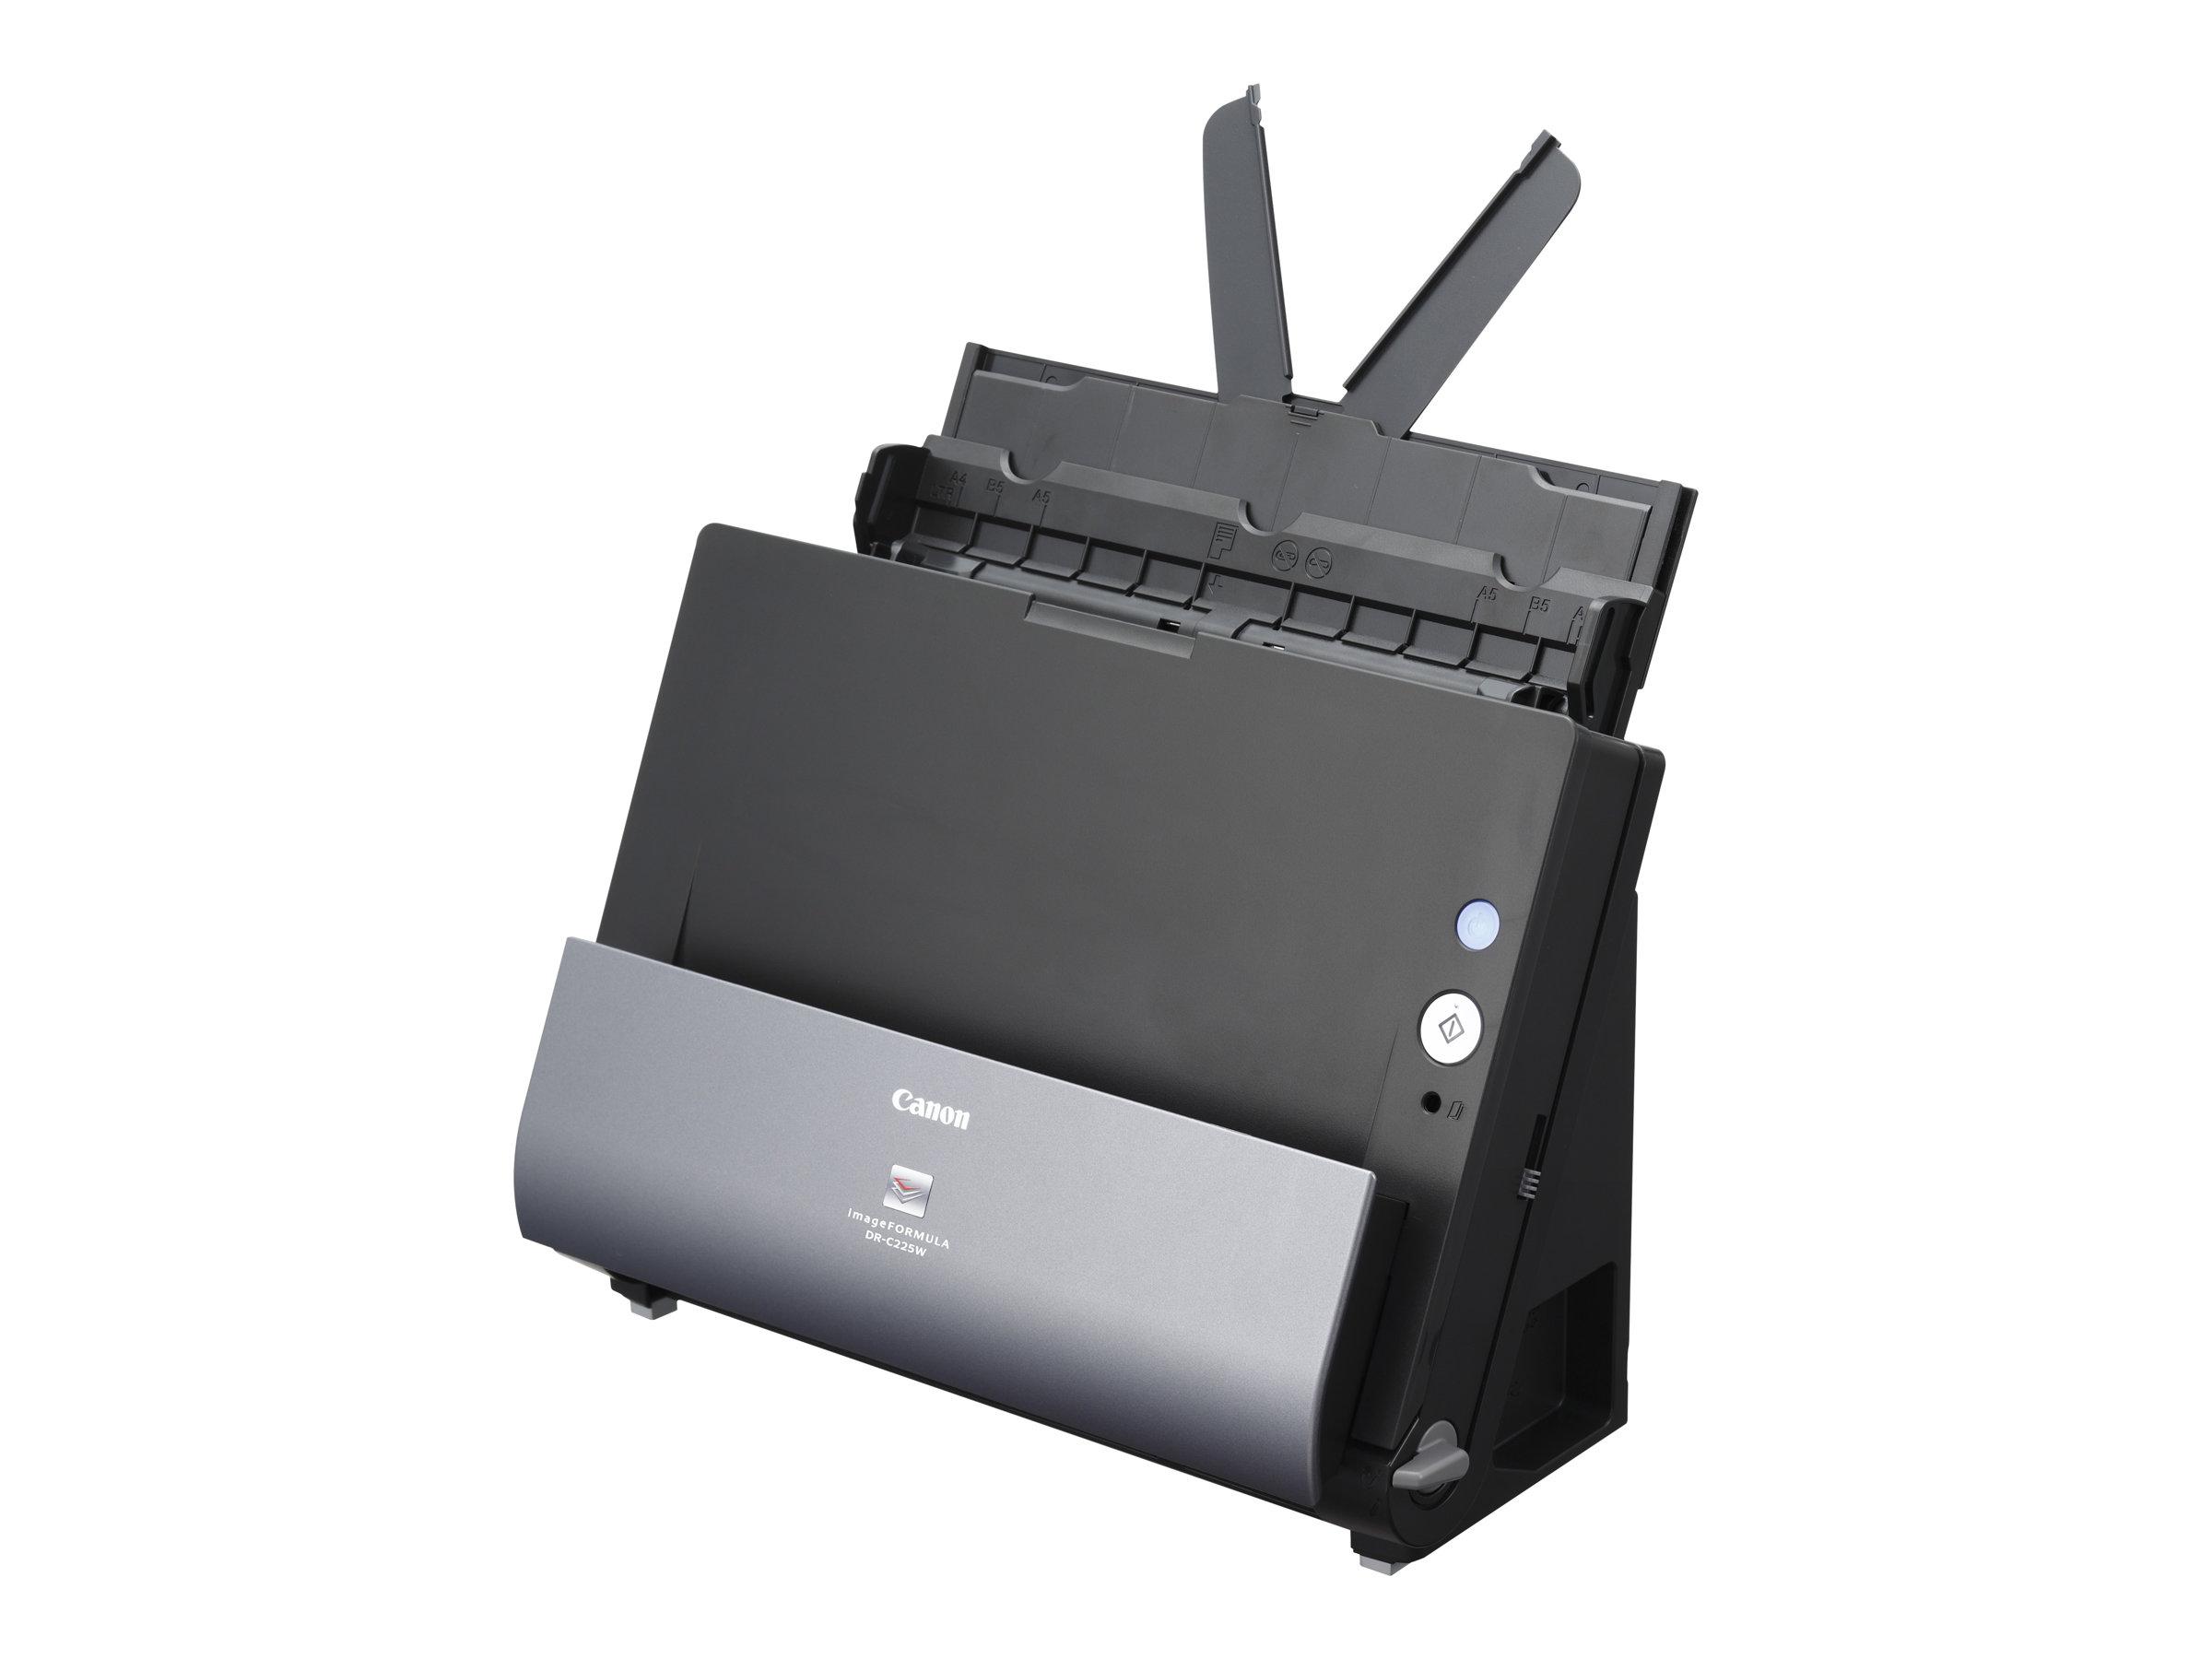 Canon imageFORMULA DR-C225W - Dokumentenscanner